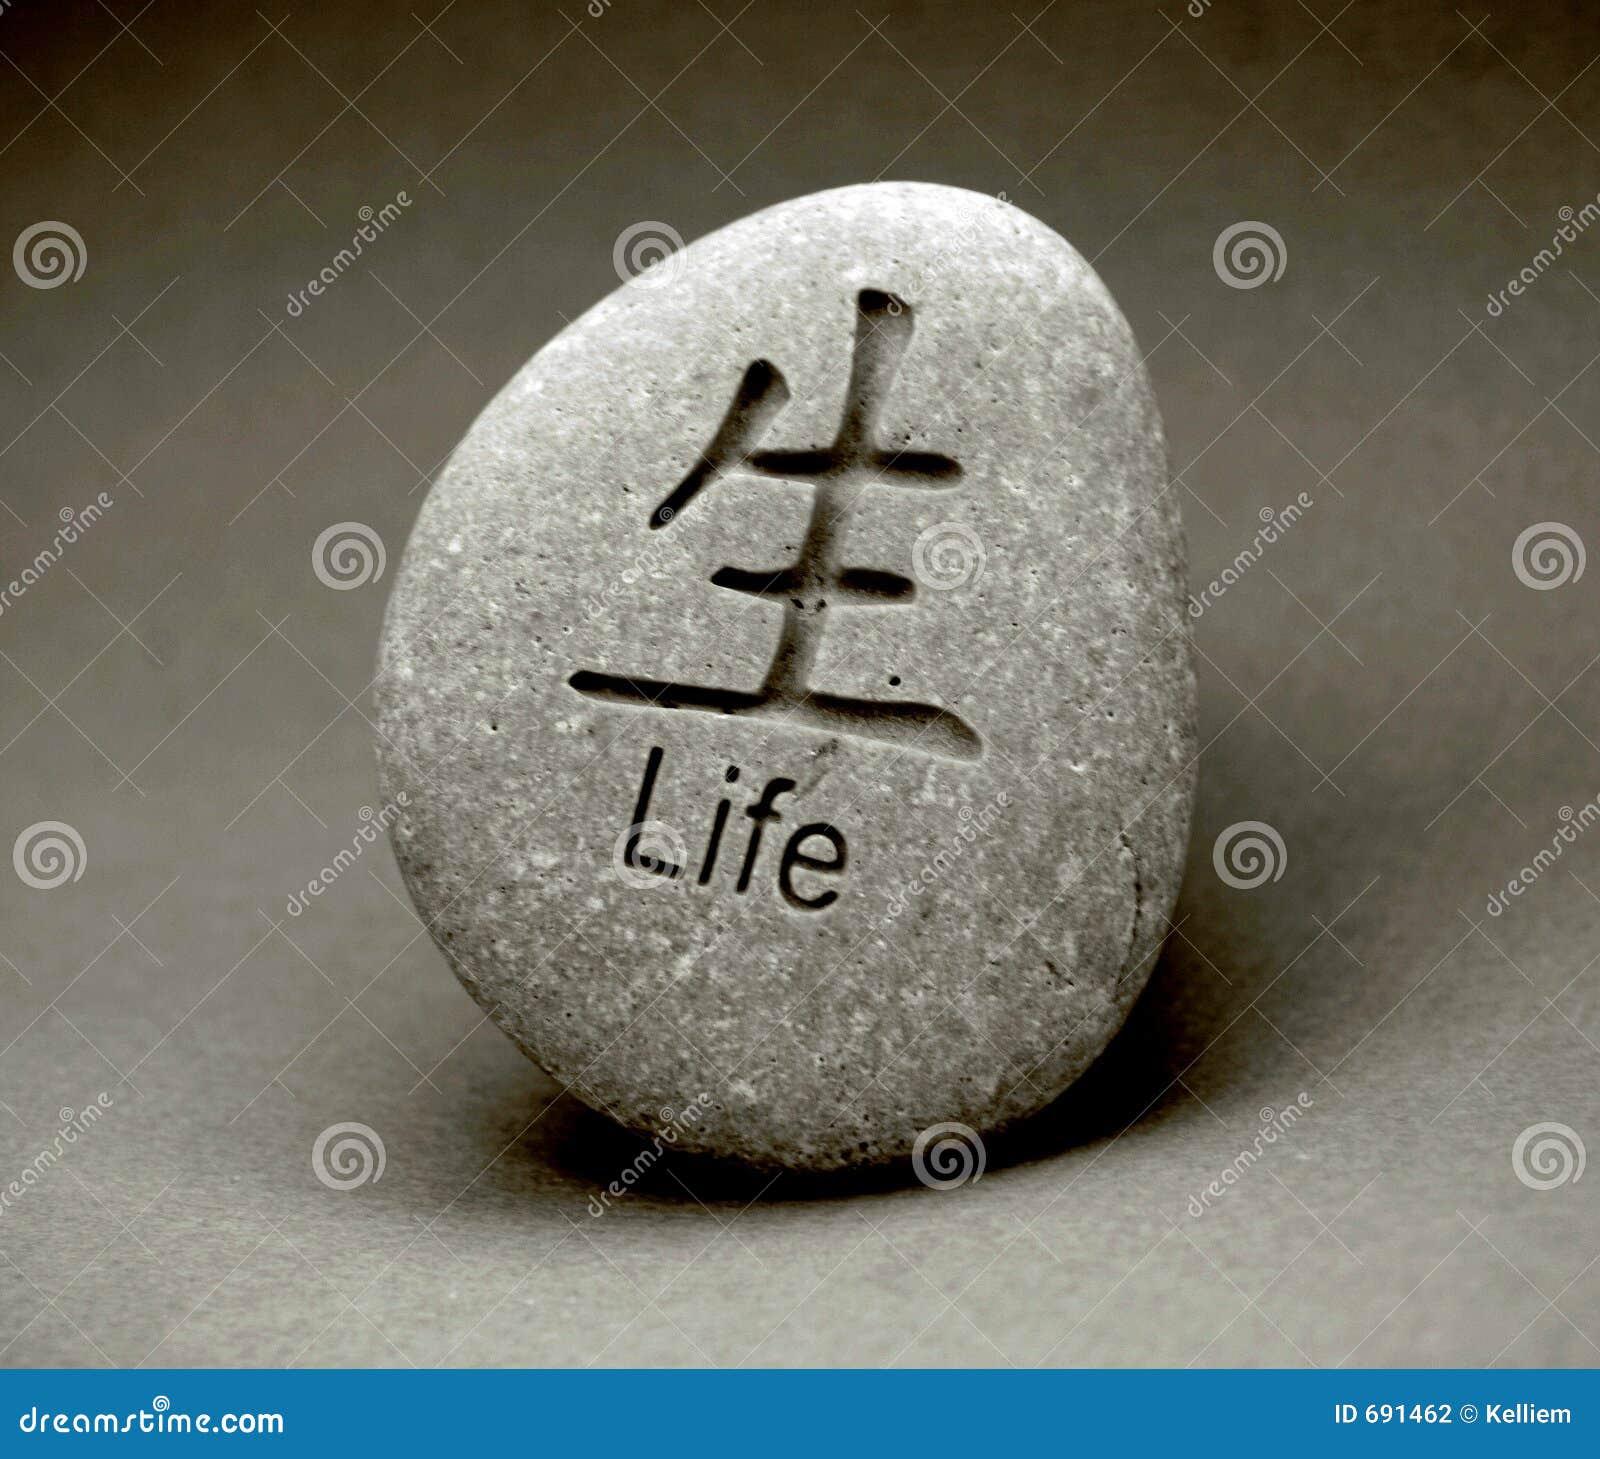 enjoy life 691462